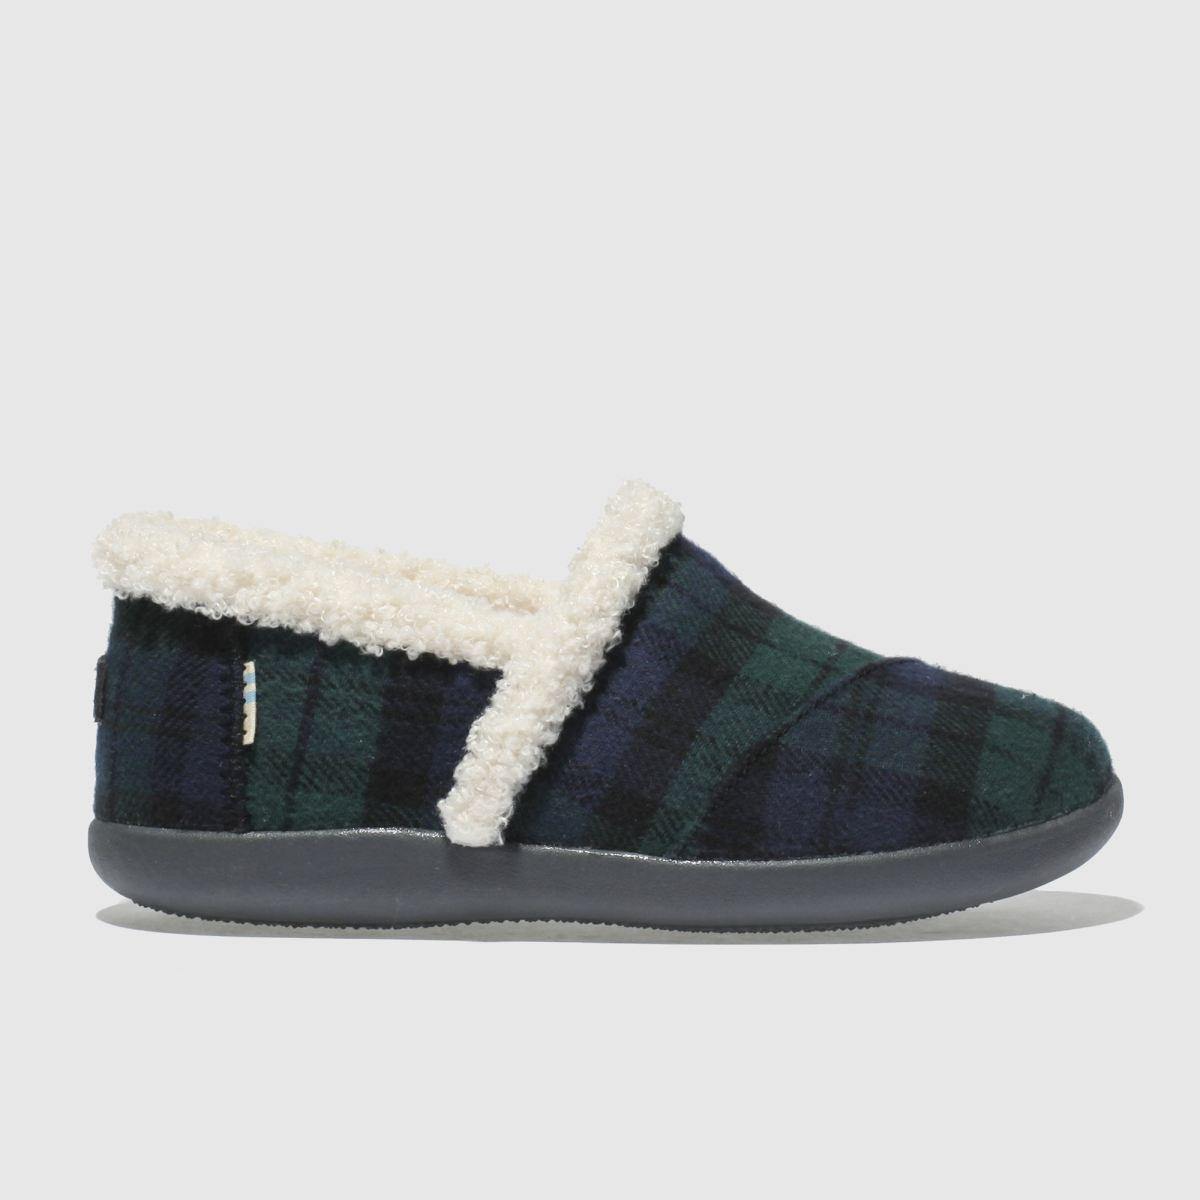 Toms Dark Green House Slipper Boots Junior